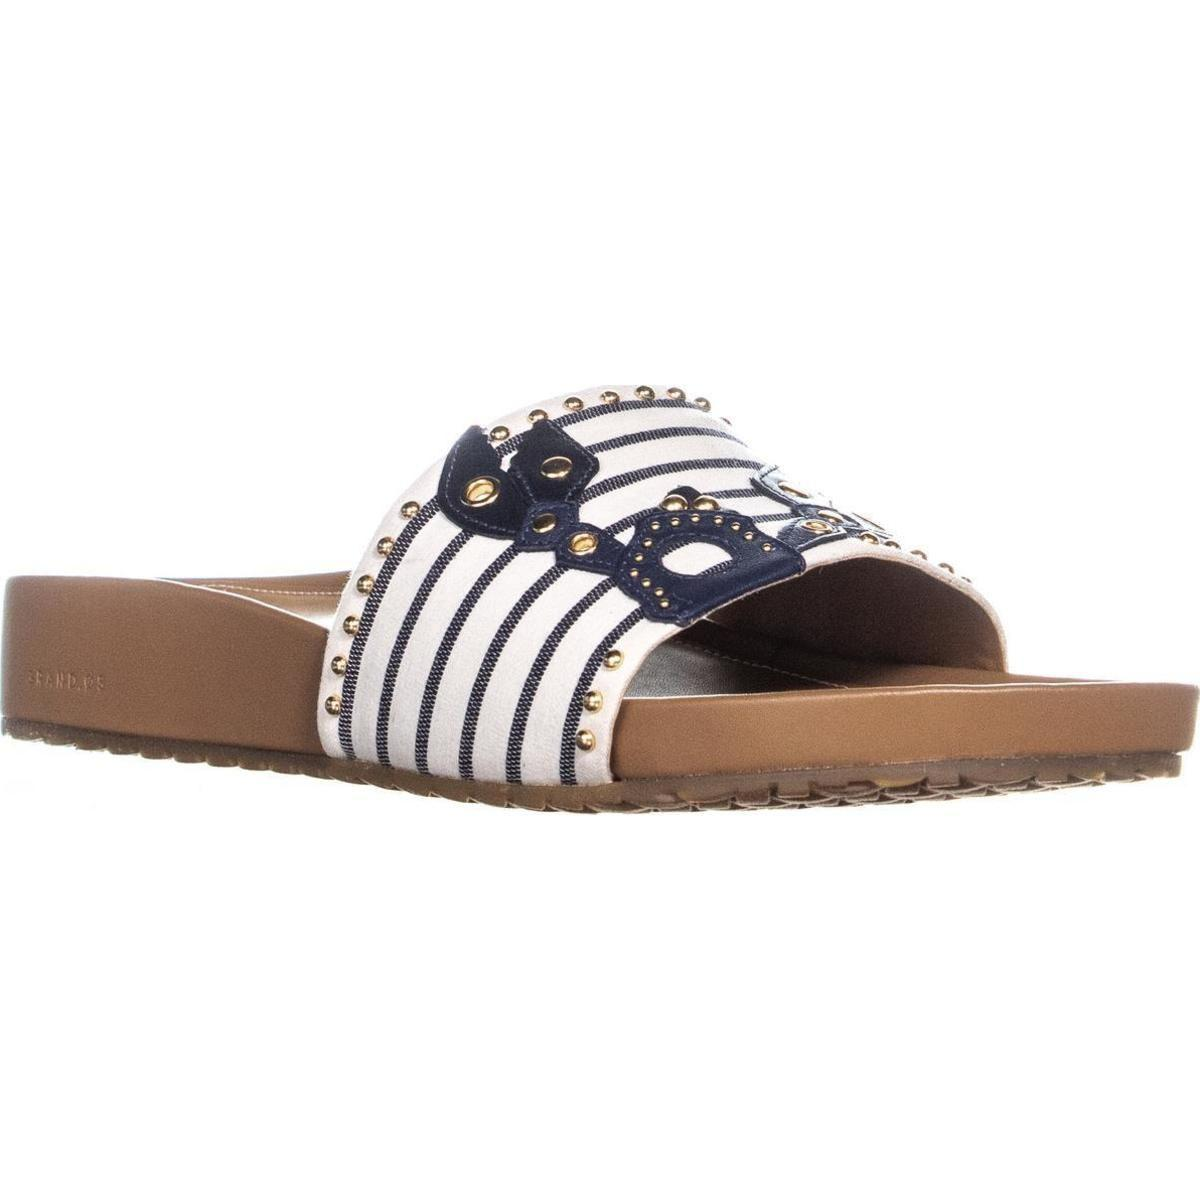 25d9941185e Lyst - Cole Haan Pinch Lobster Sandals